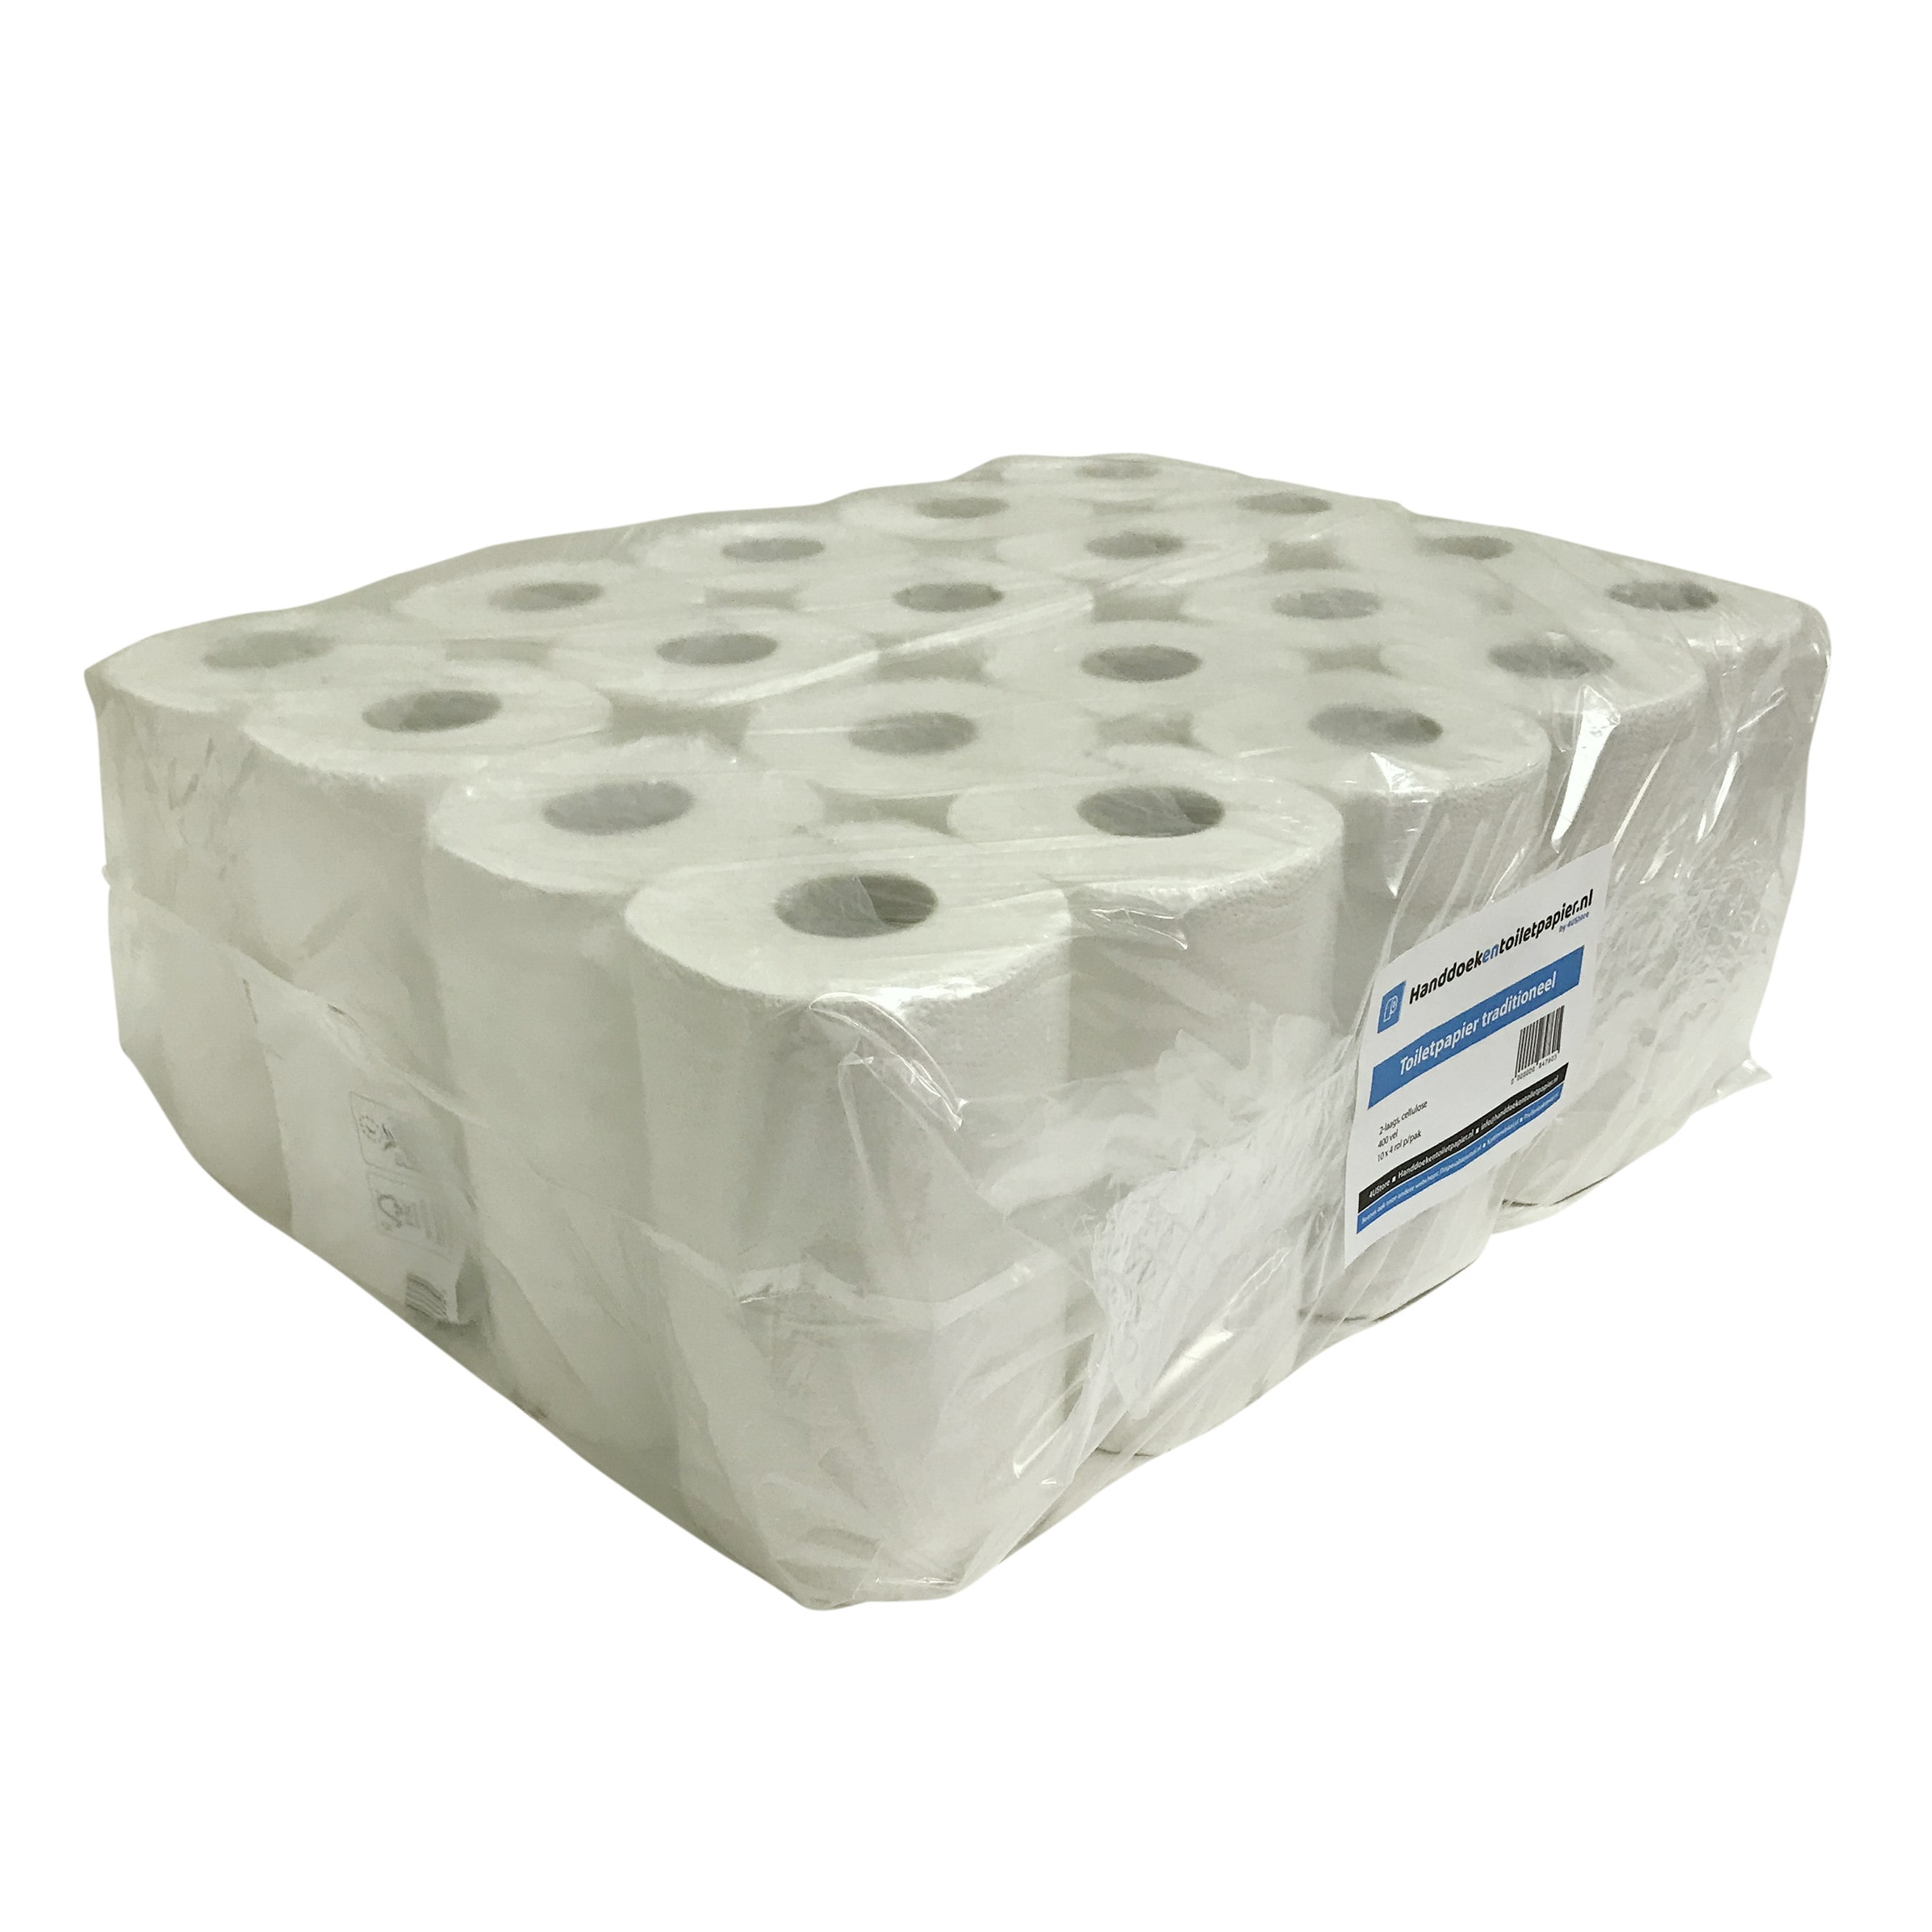 4UStore toiletpapier cellulose 2-laags